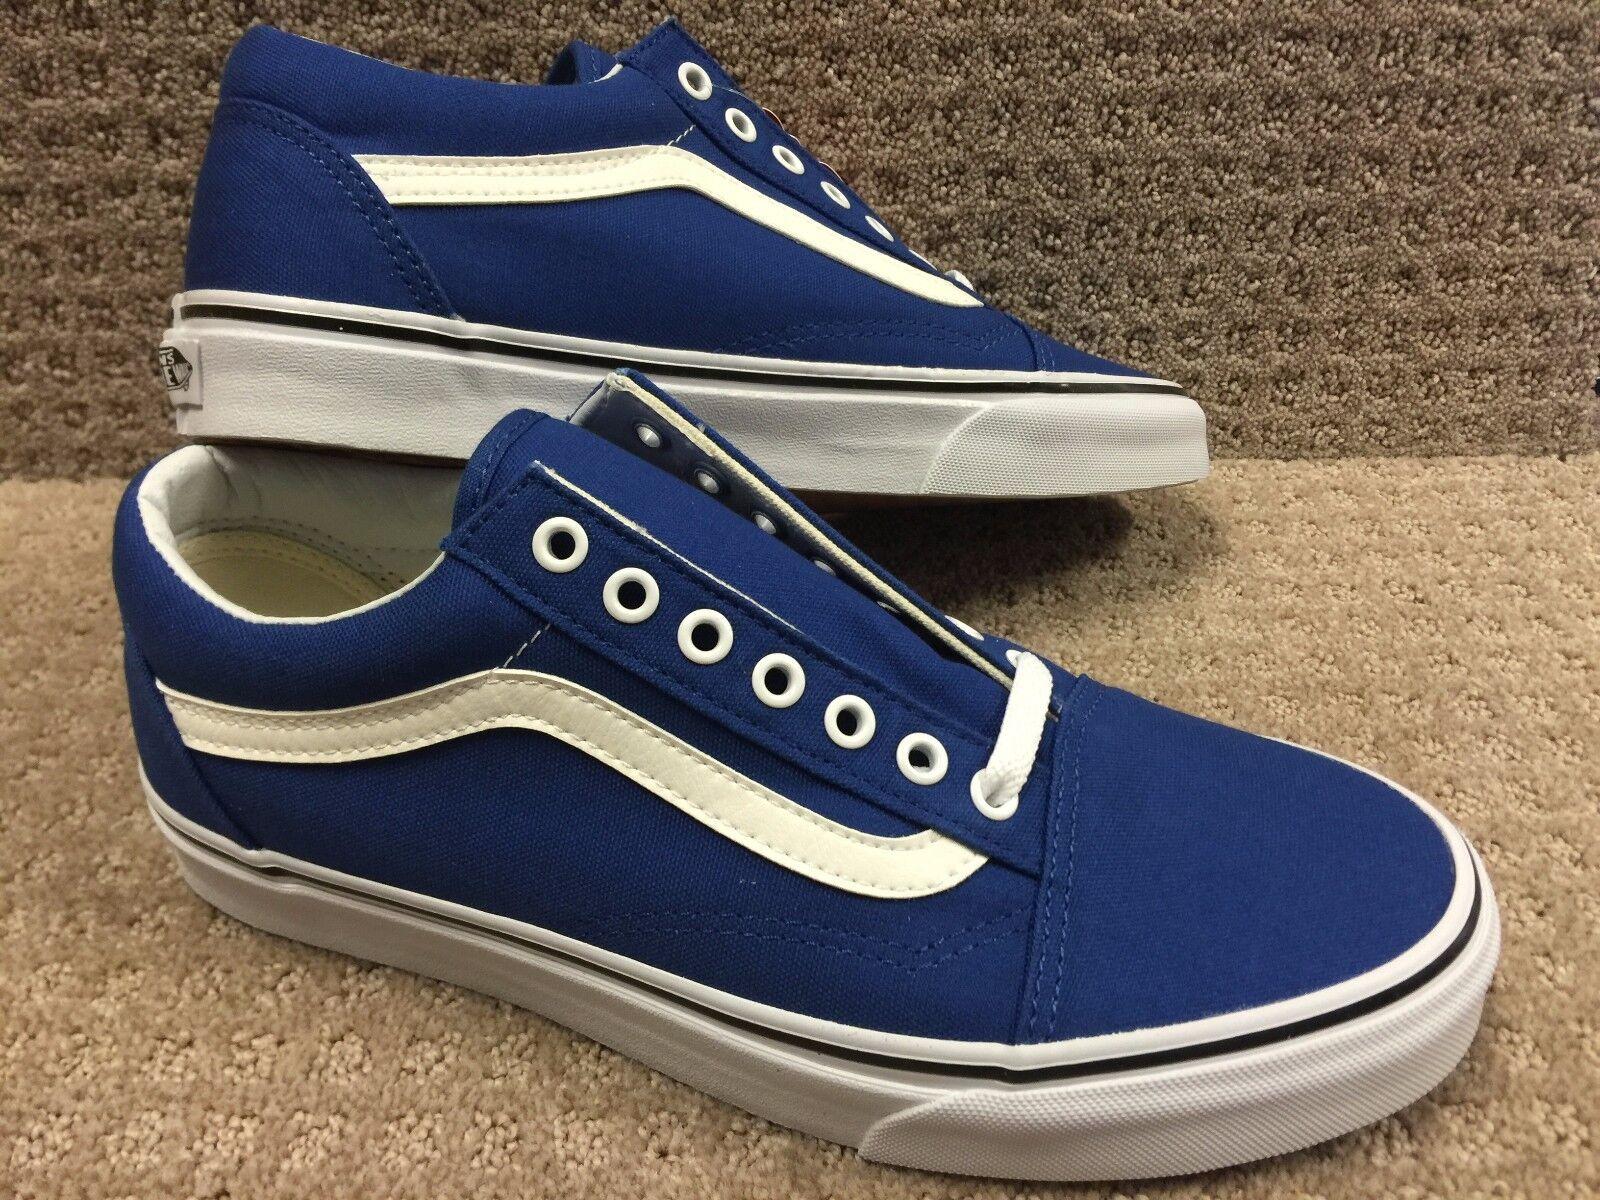 Vans Men's shoes's  Old Skool  -- (Canvas) True bluee